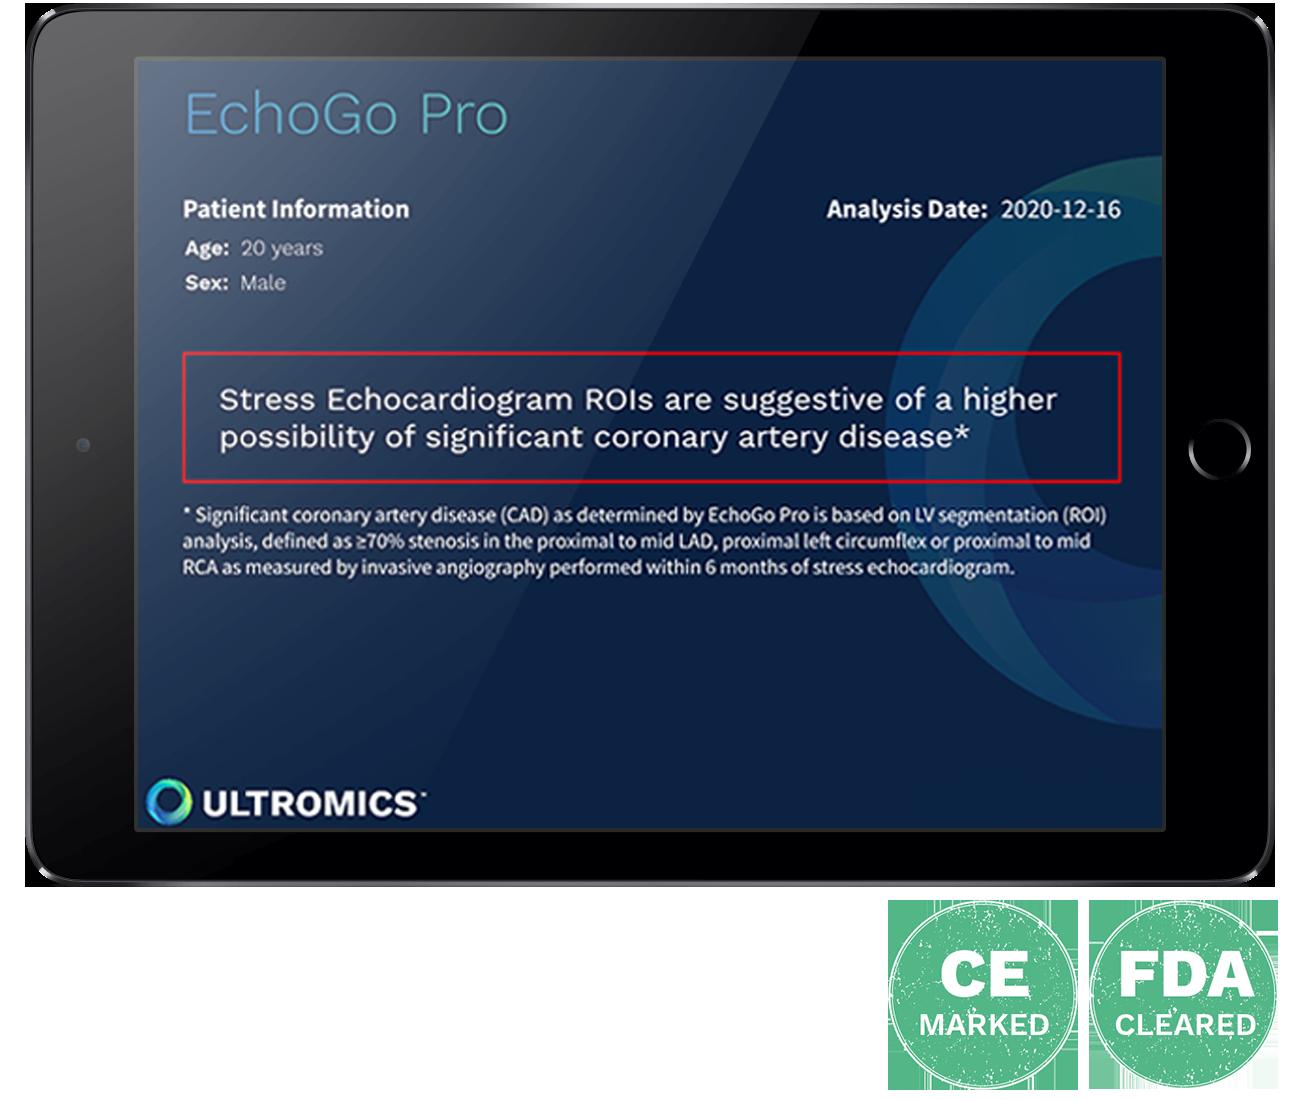 echogo-pro-report-fda-ce-icons-1